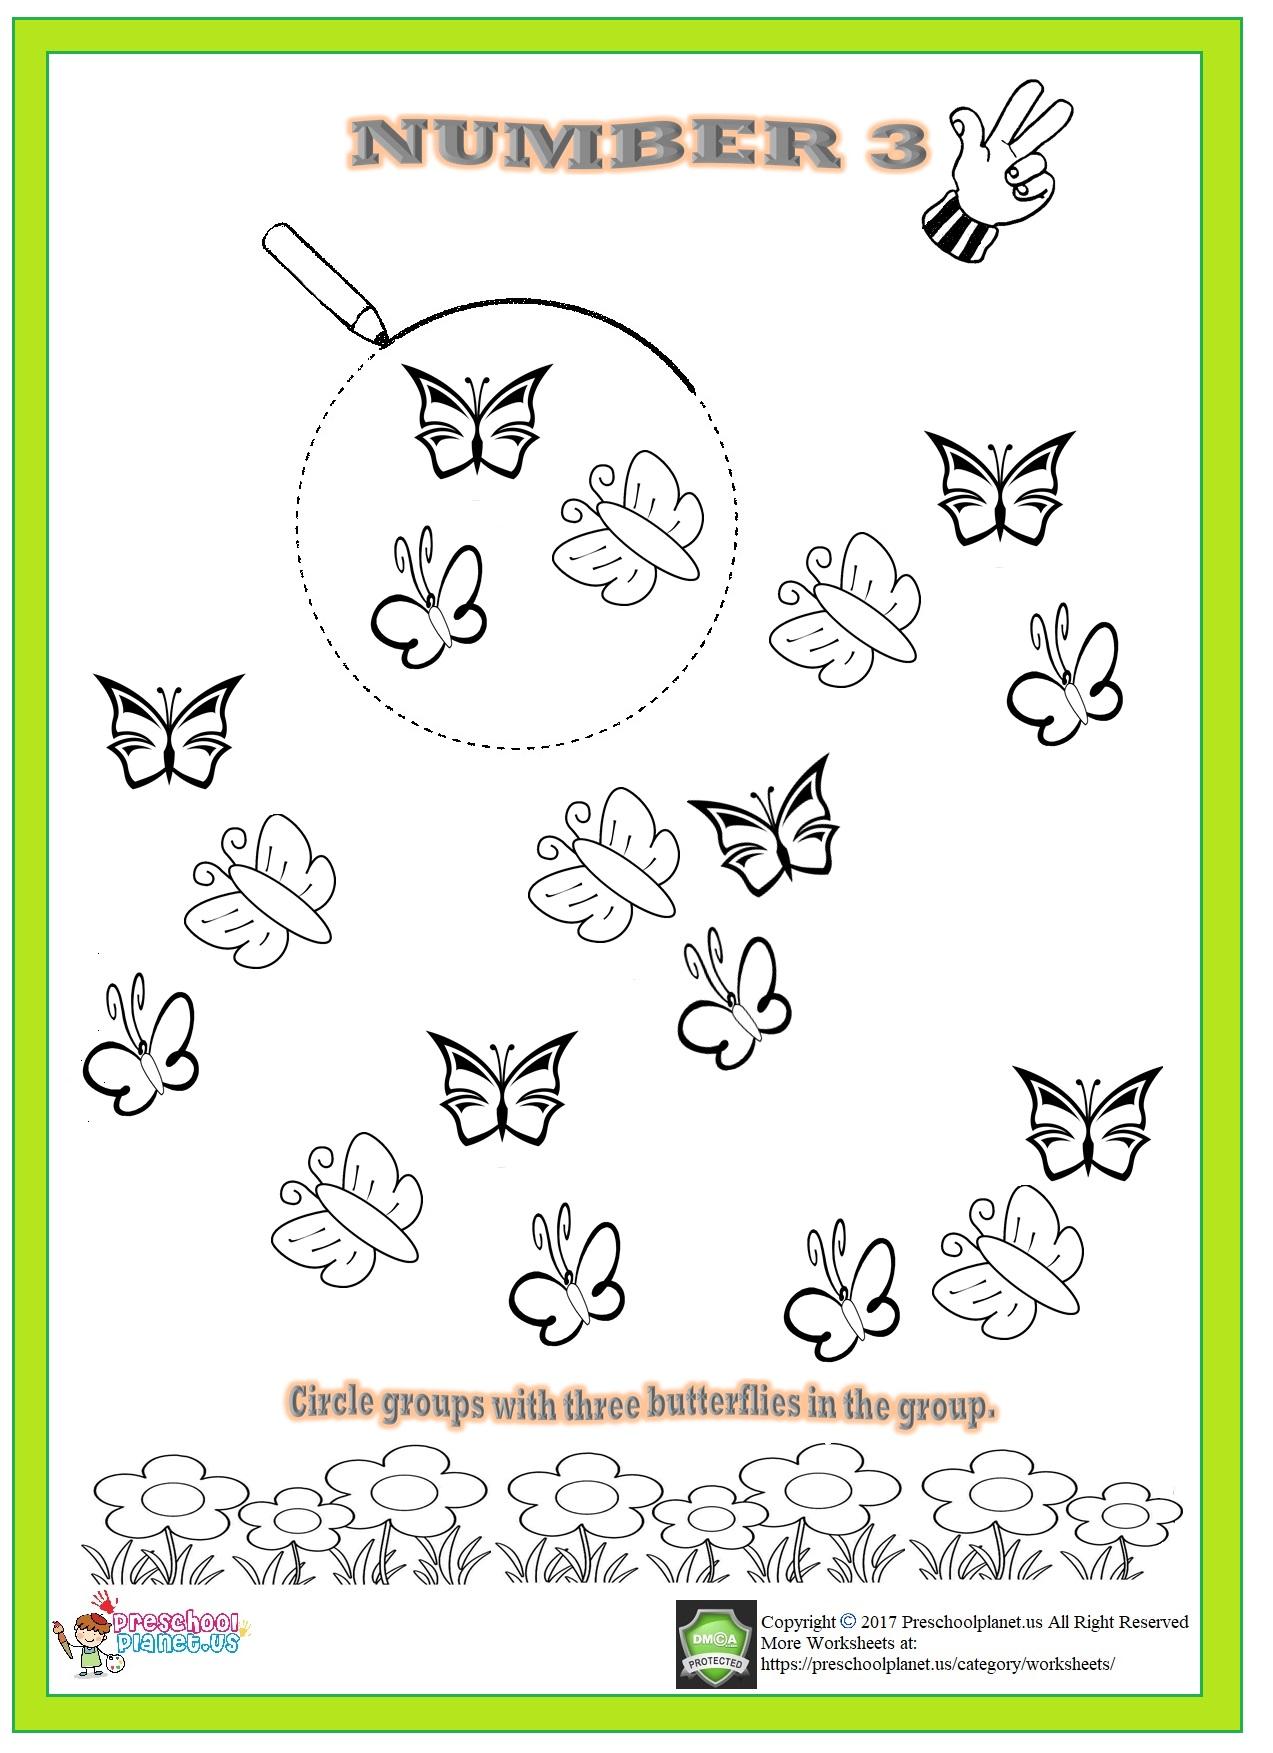 Number 3 Worksheet For Kindergarten on Life Cycle Of A Flower Worksheet